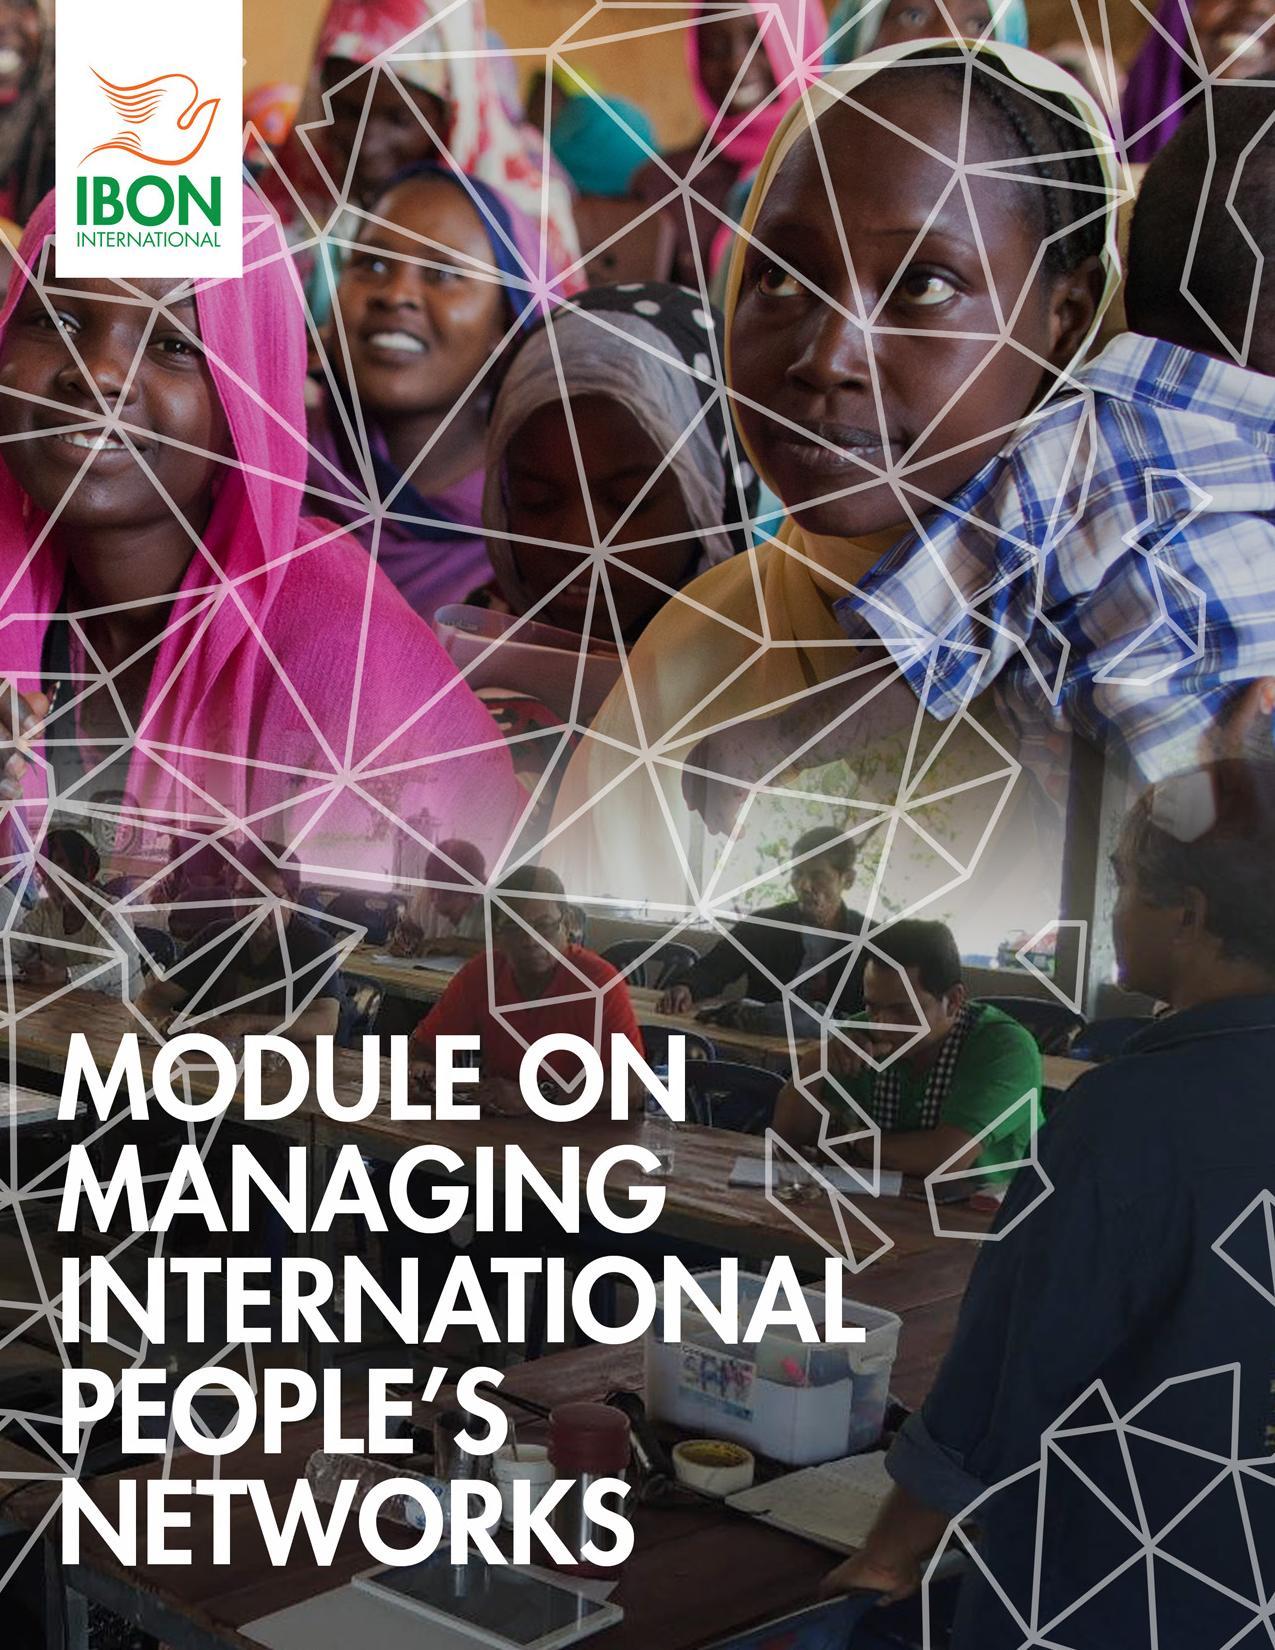 Module on Managing International People's Networks